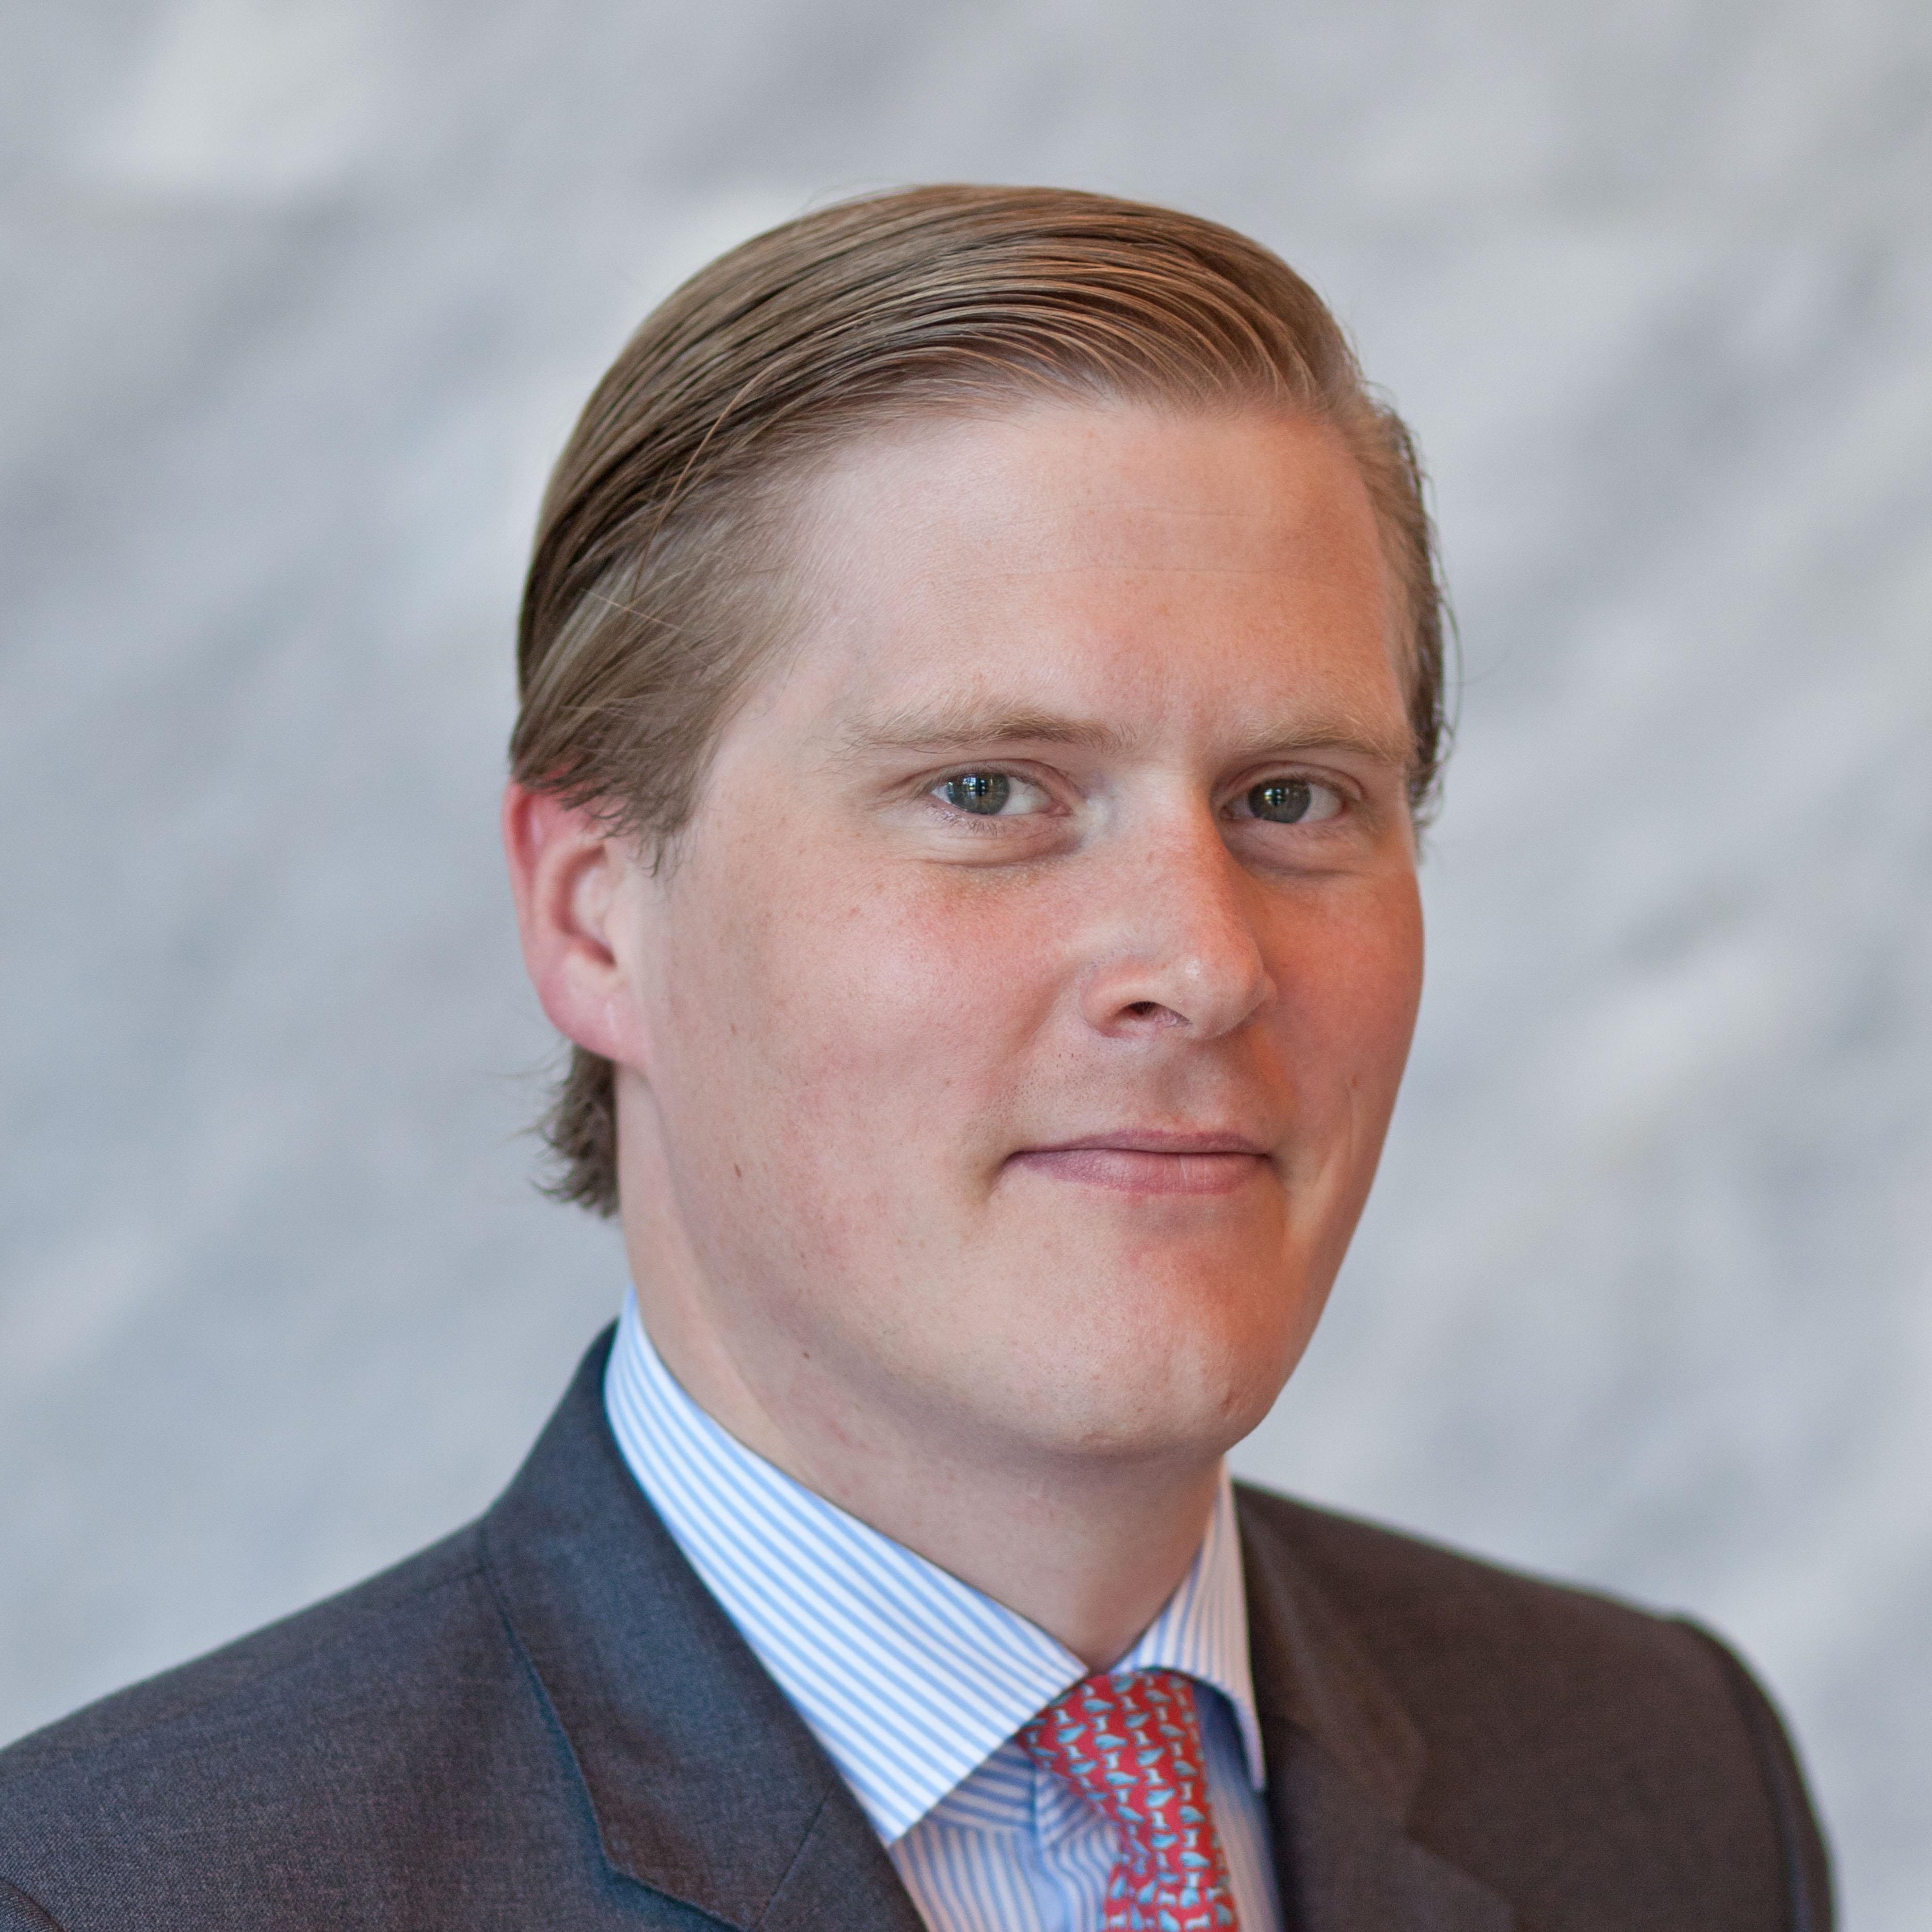 Valentin Winger, Head of Group Regulatory Transformation at Raiffeisen Bank International AG